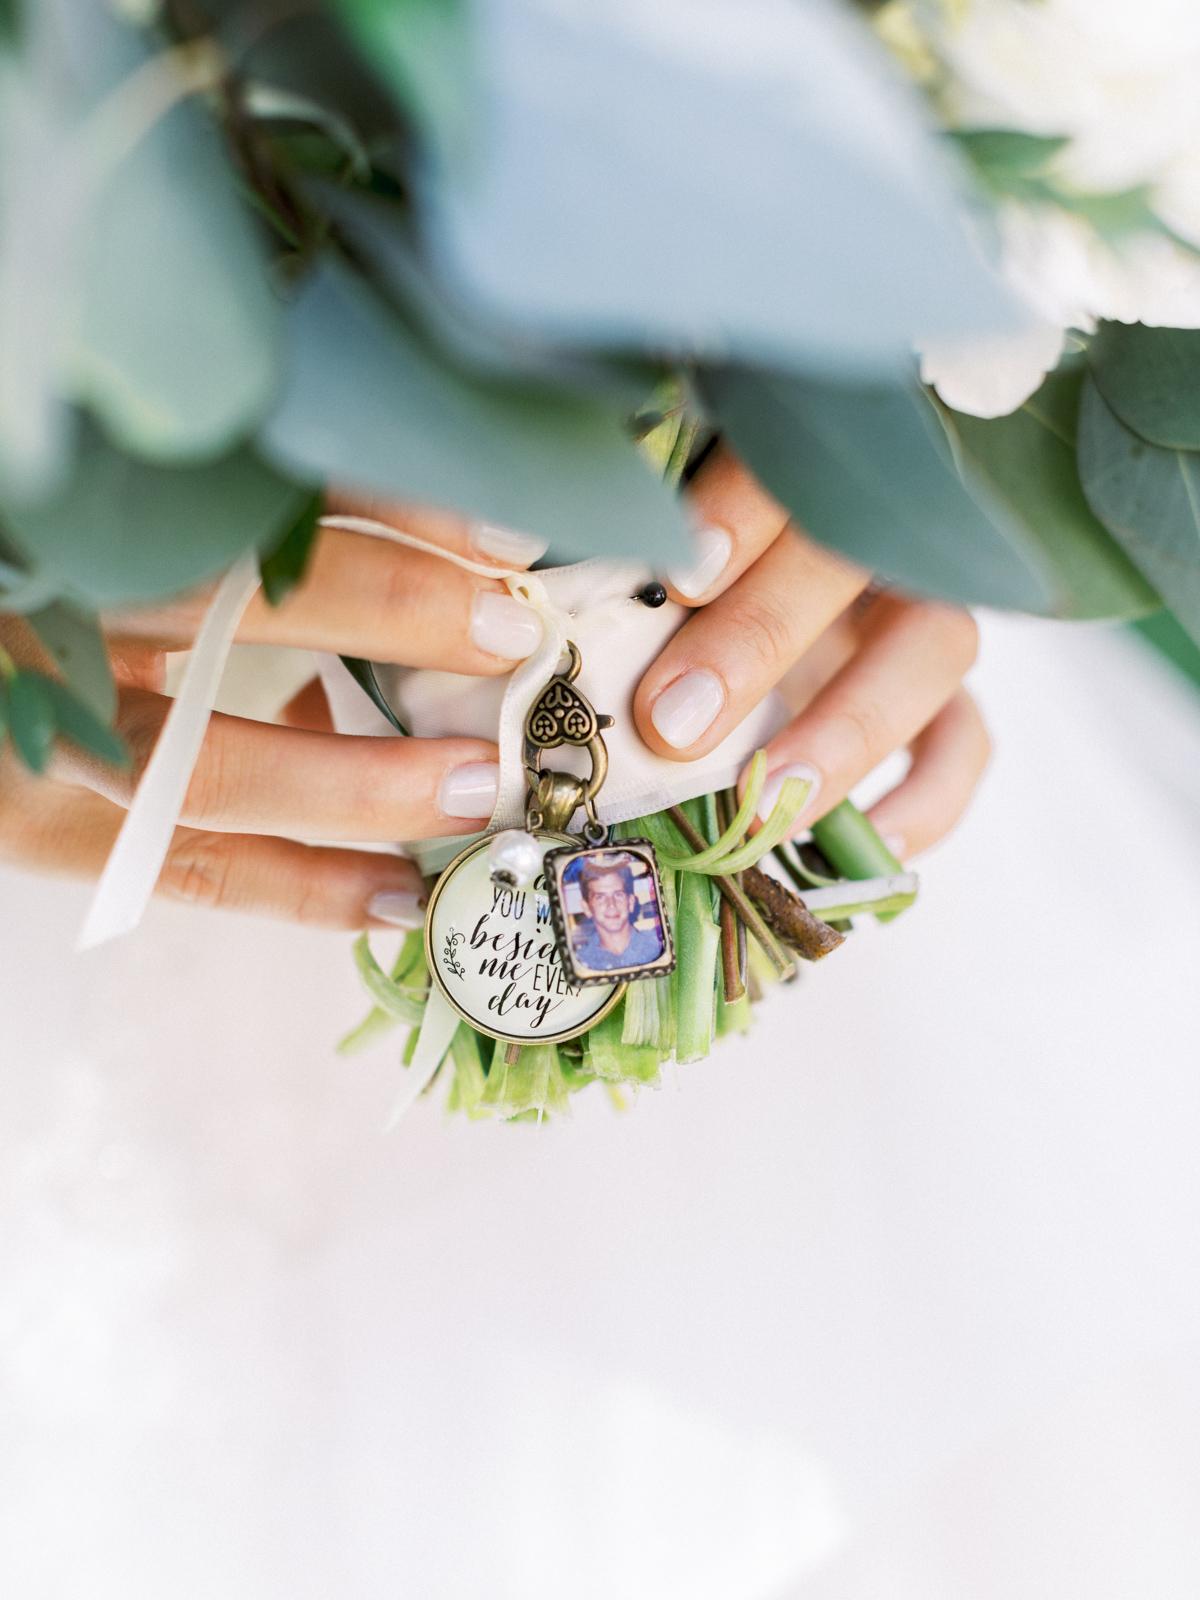 winmock-kinderton-wedding-019.jpg